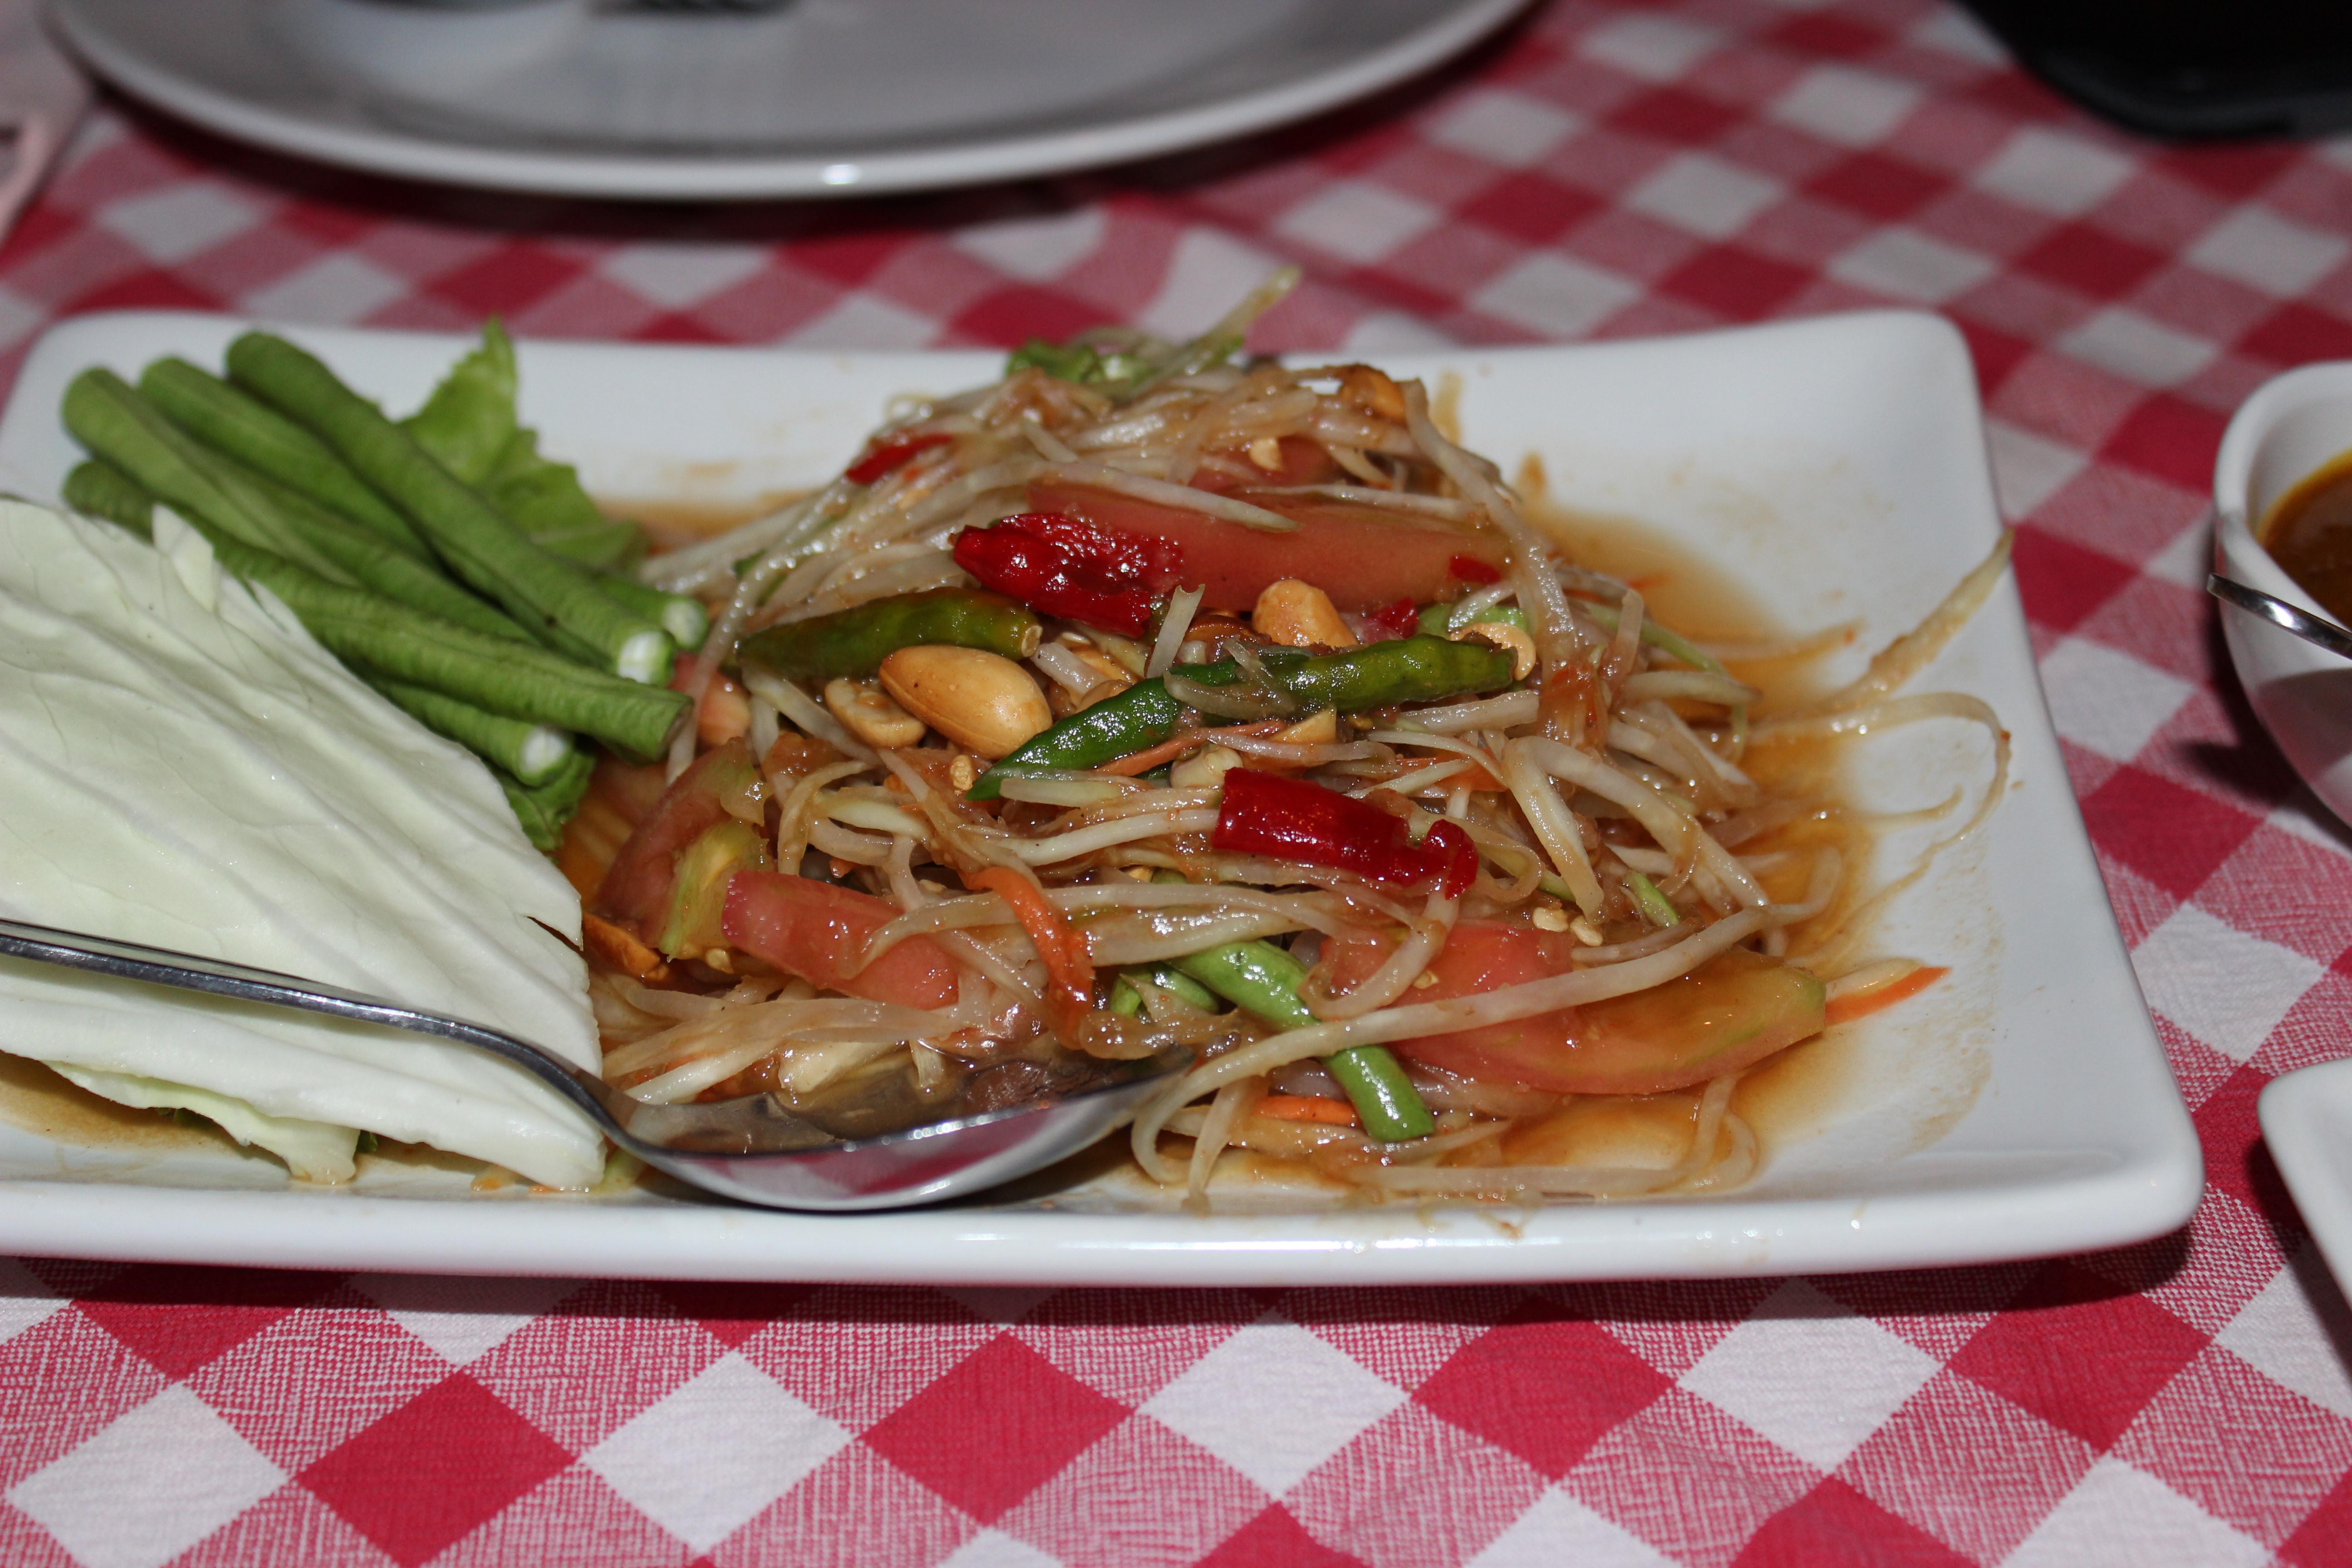 Tajlandia od kuchni cz. I